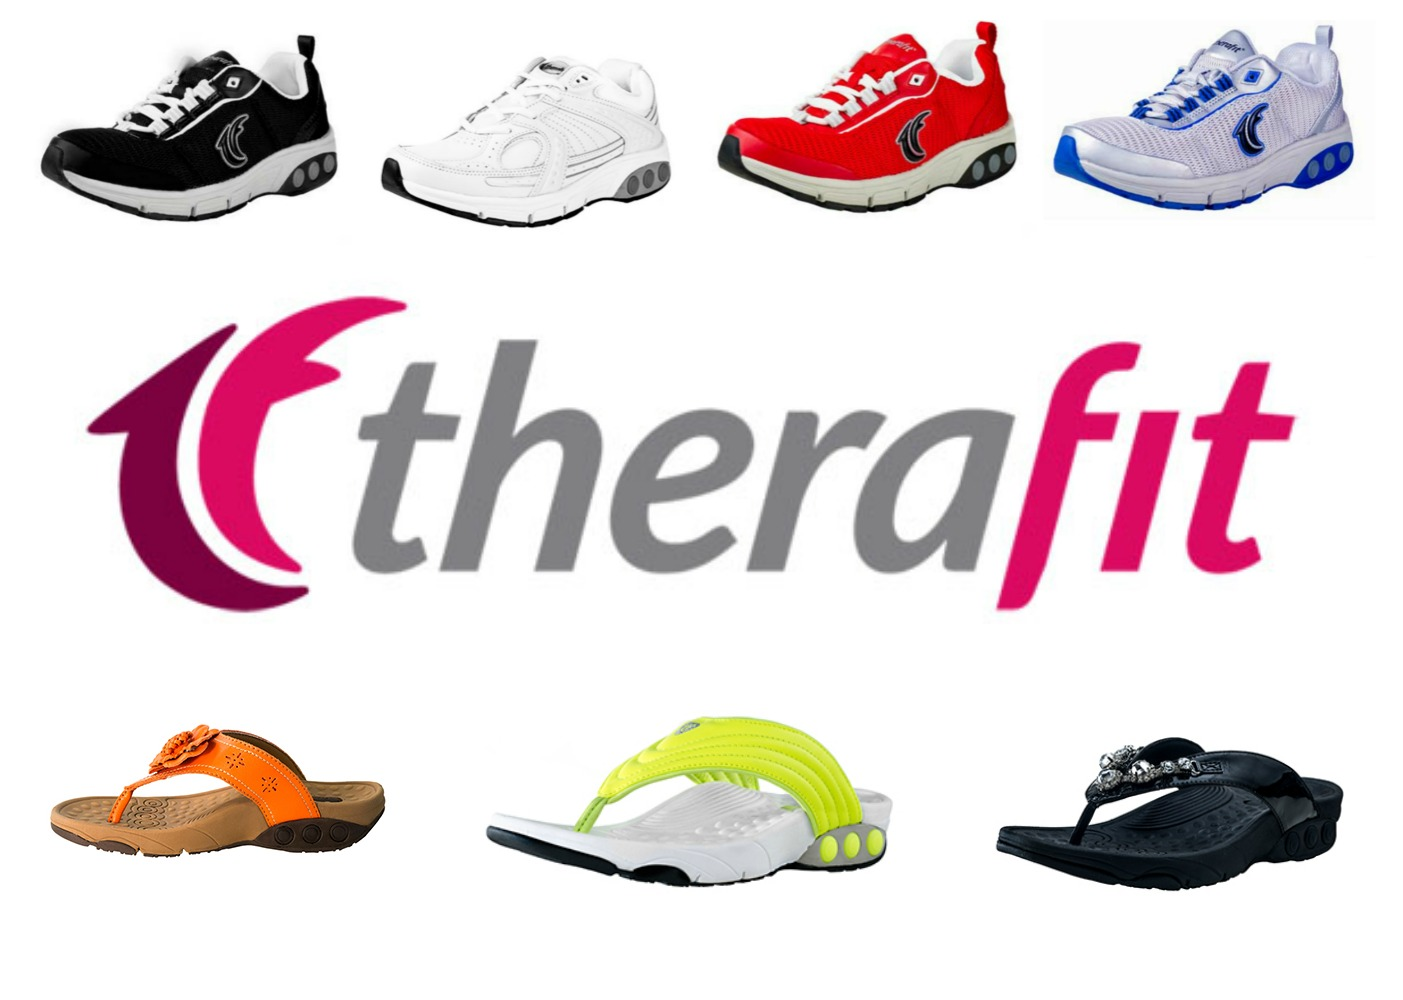 Therafit Summer Women's Fabric Slingback Sport Sandal, comfortable and stylish!